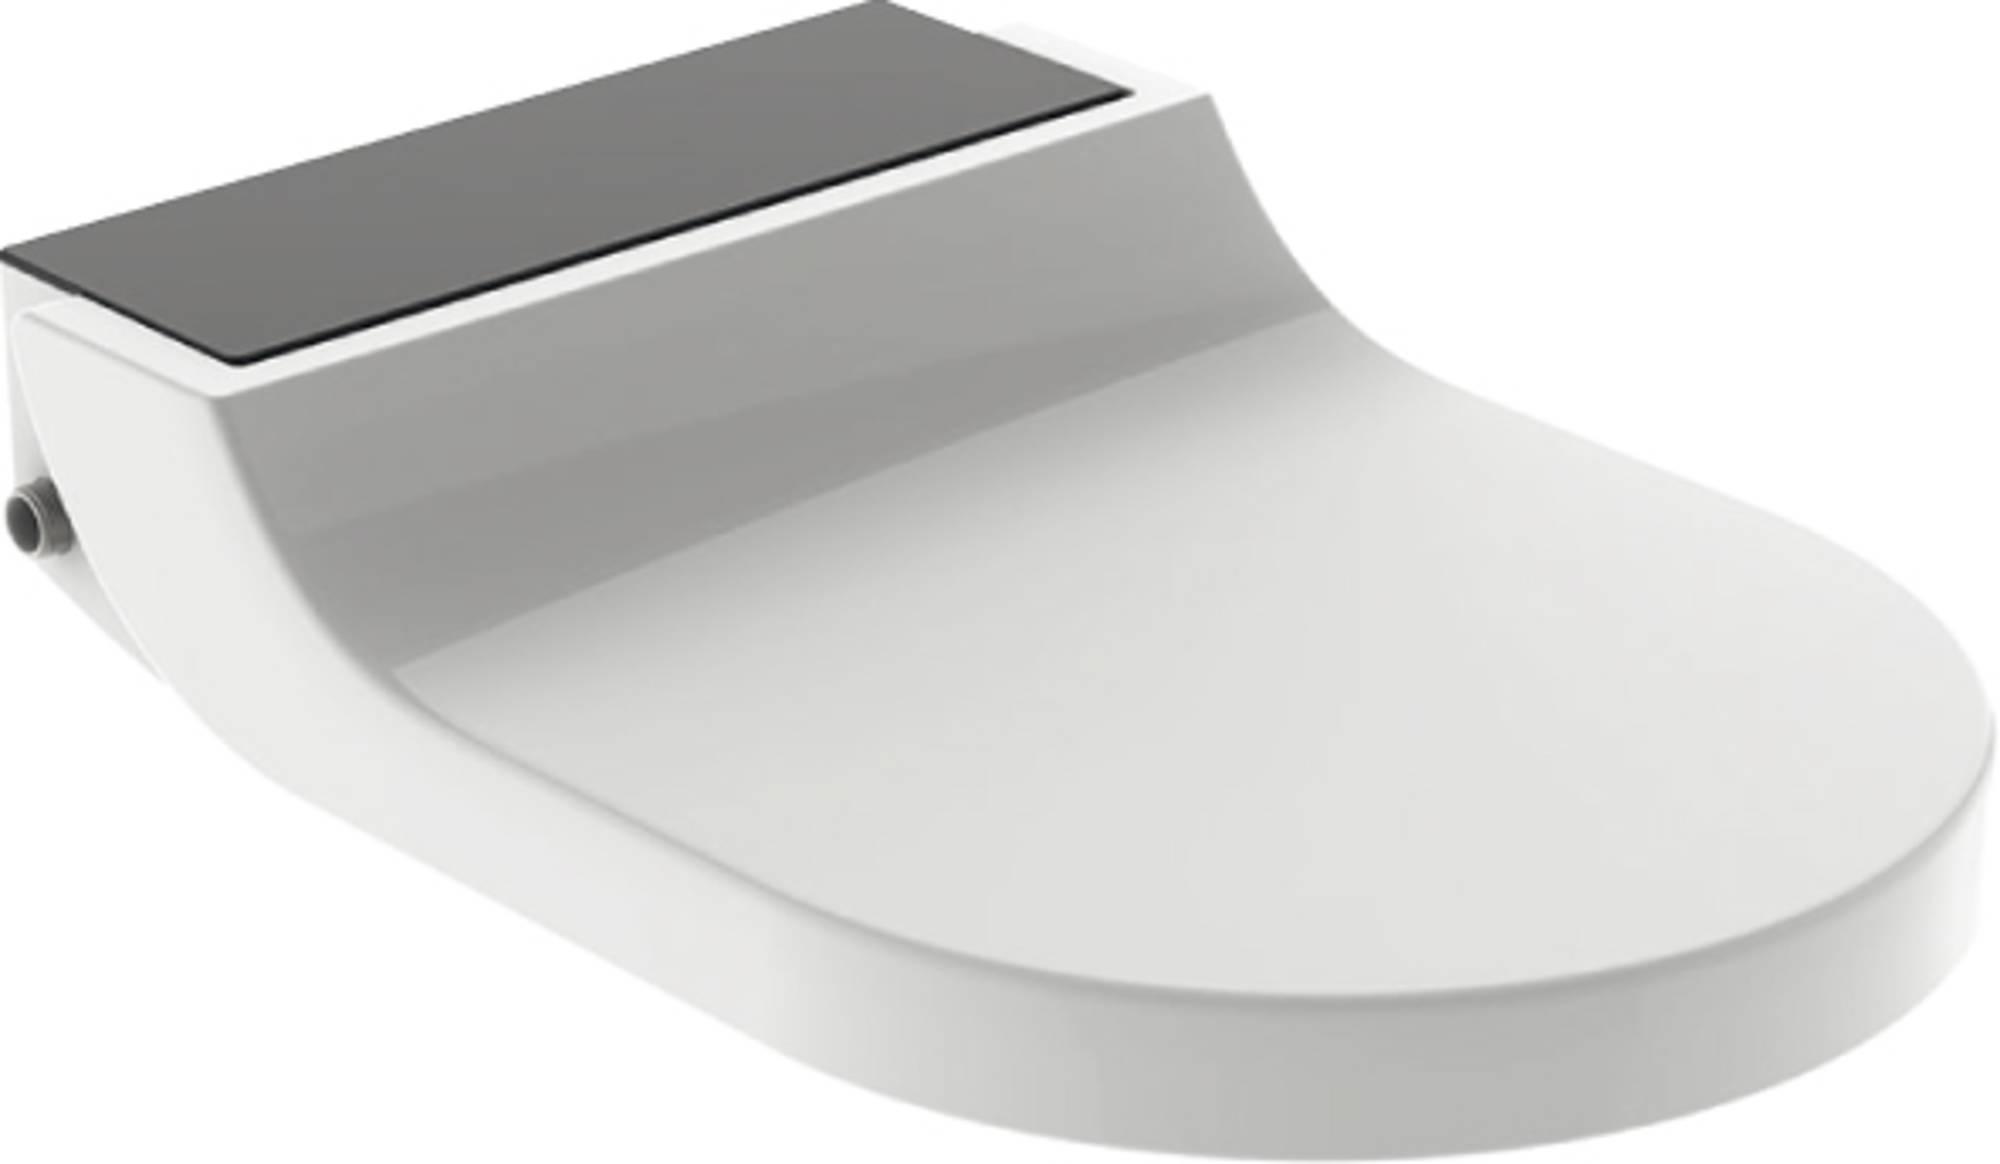 Productafbeelding van Geberit AquaClean closetzitting Tuma Comfort decorplaat Zwart glas